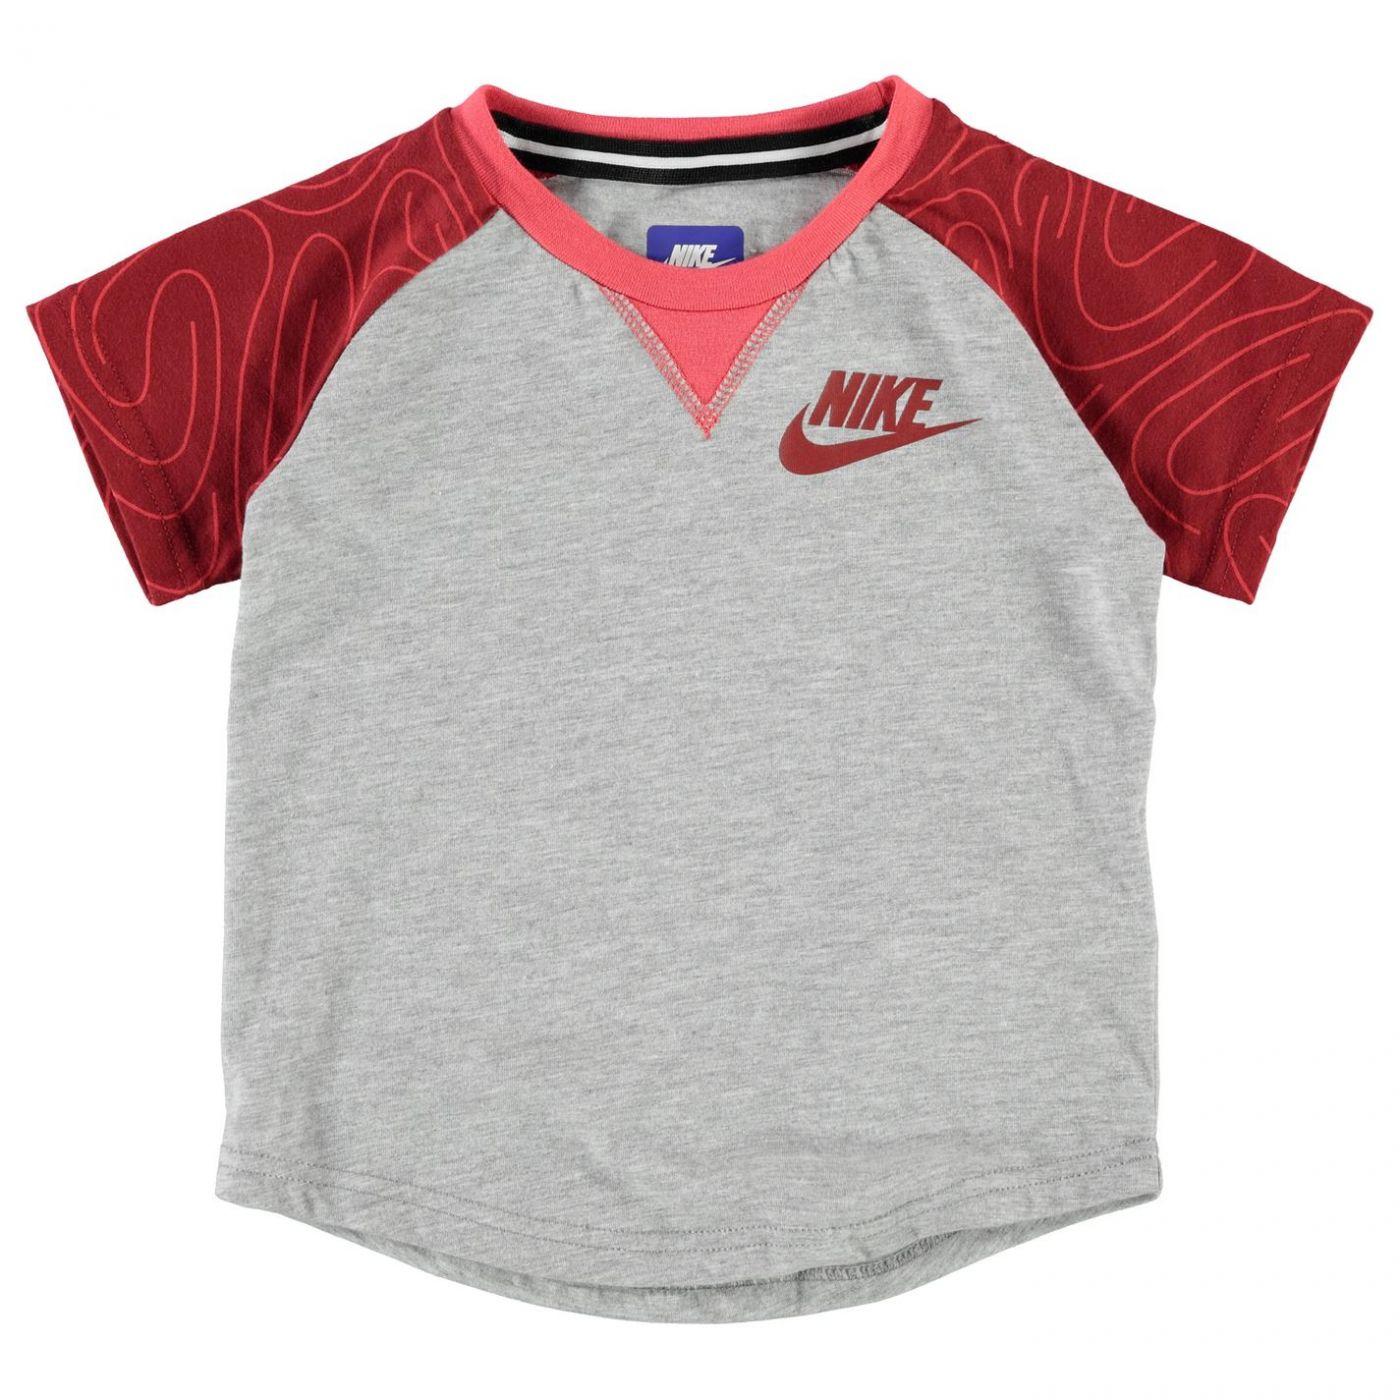 Nike Short Sleeve T Shirt Infant Boys